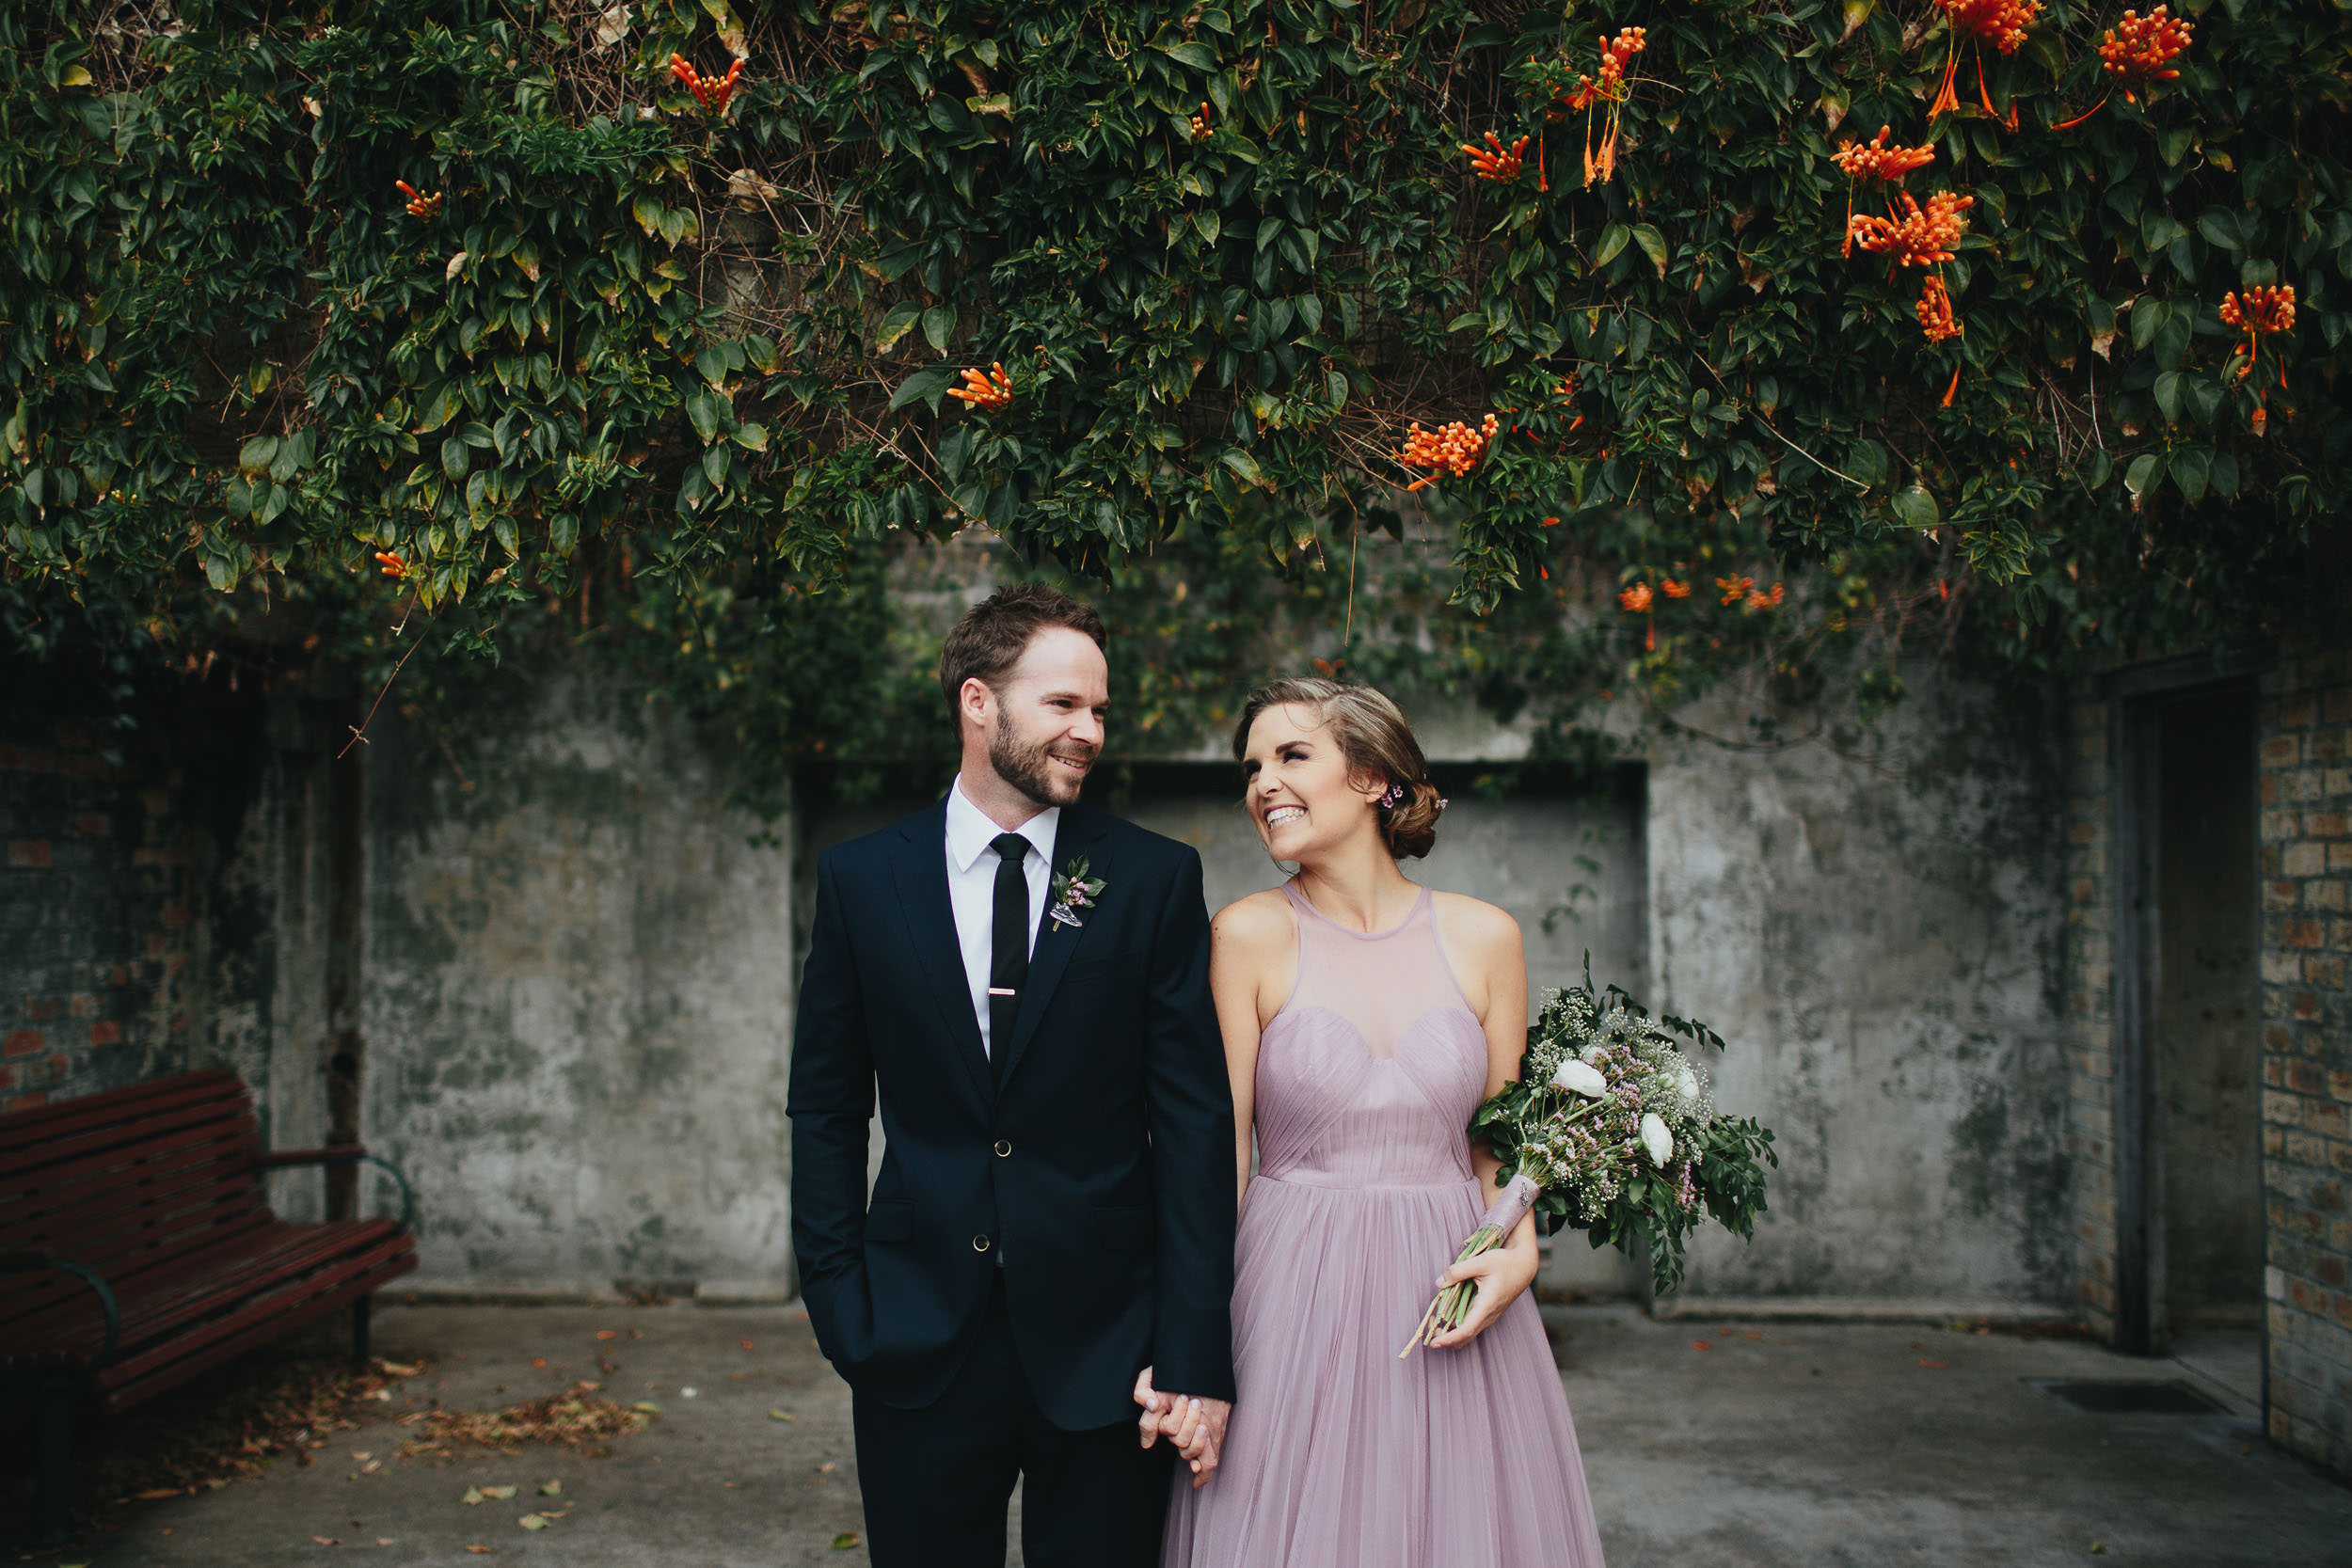 030_power_house_wedding_finch_and_oak.jpg